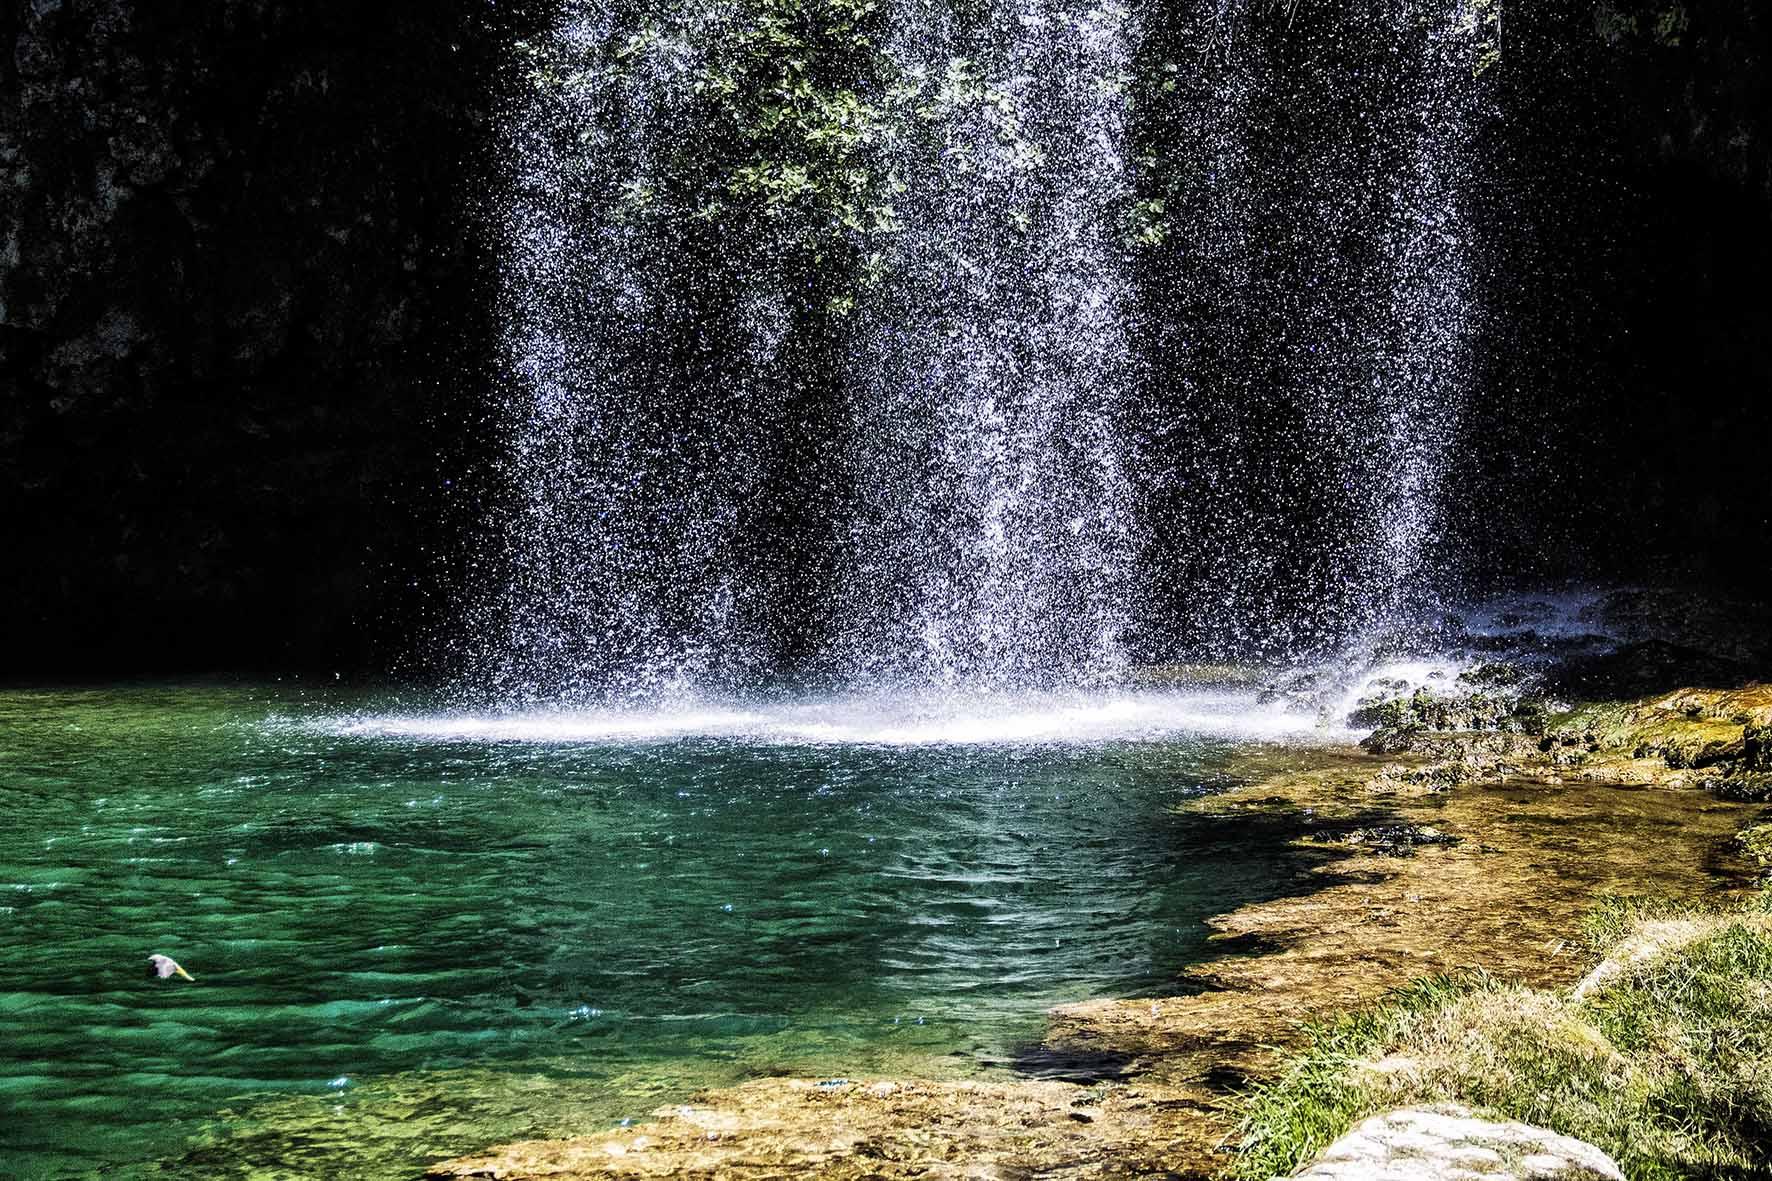 cascade-de-salles-la-source-12web